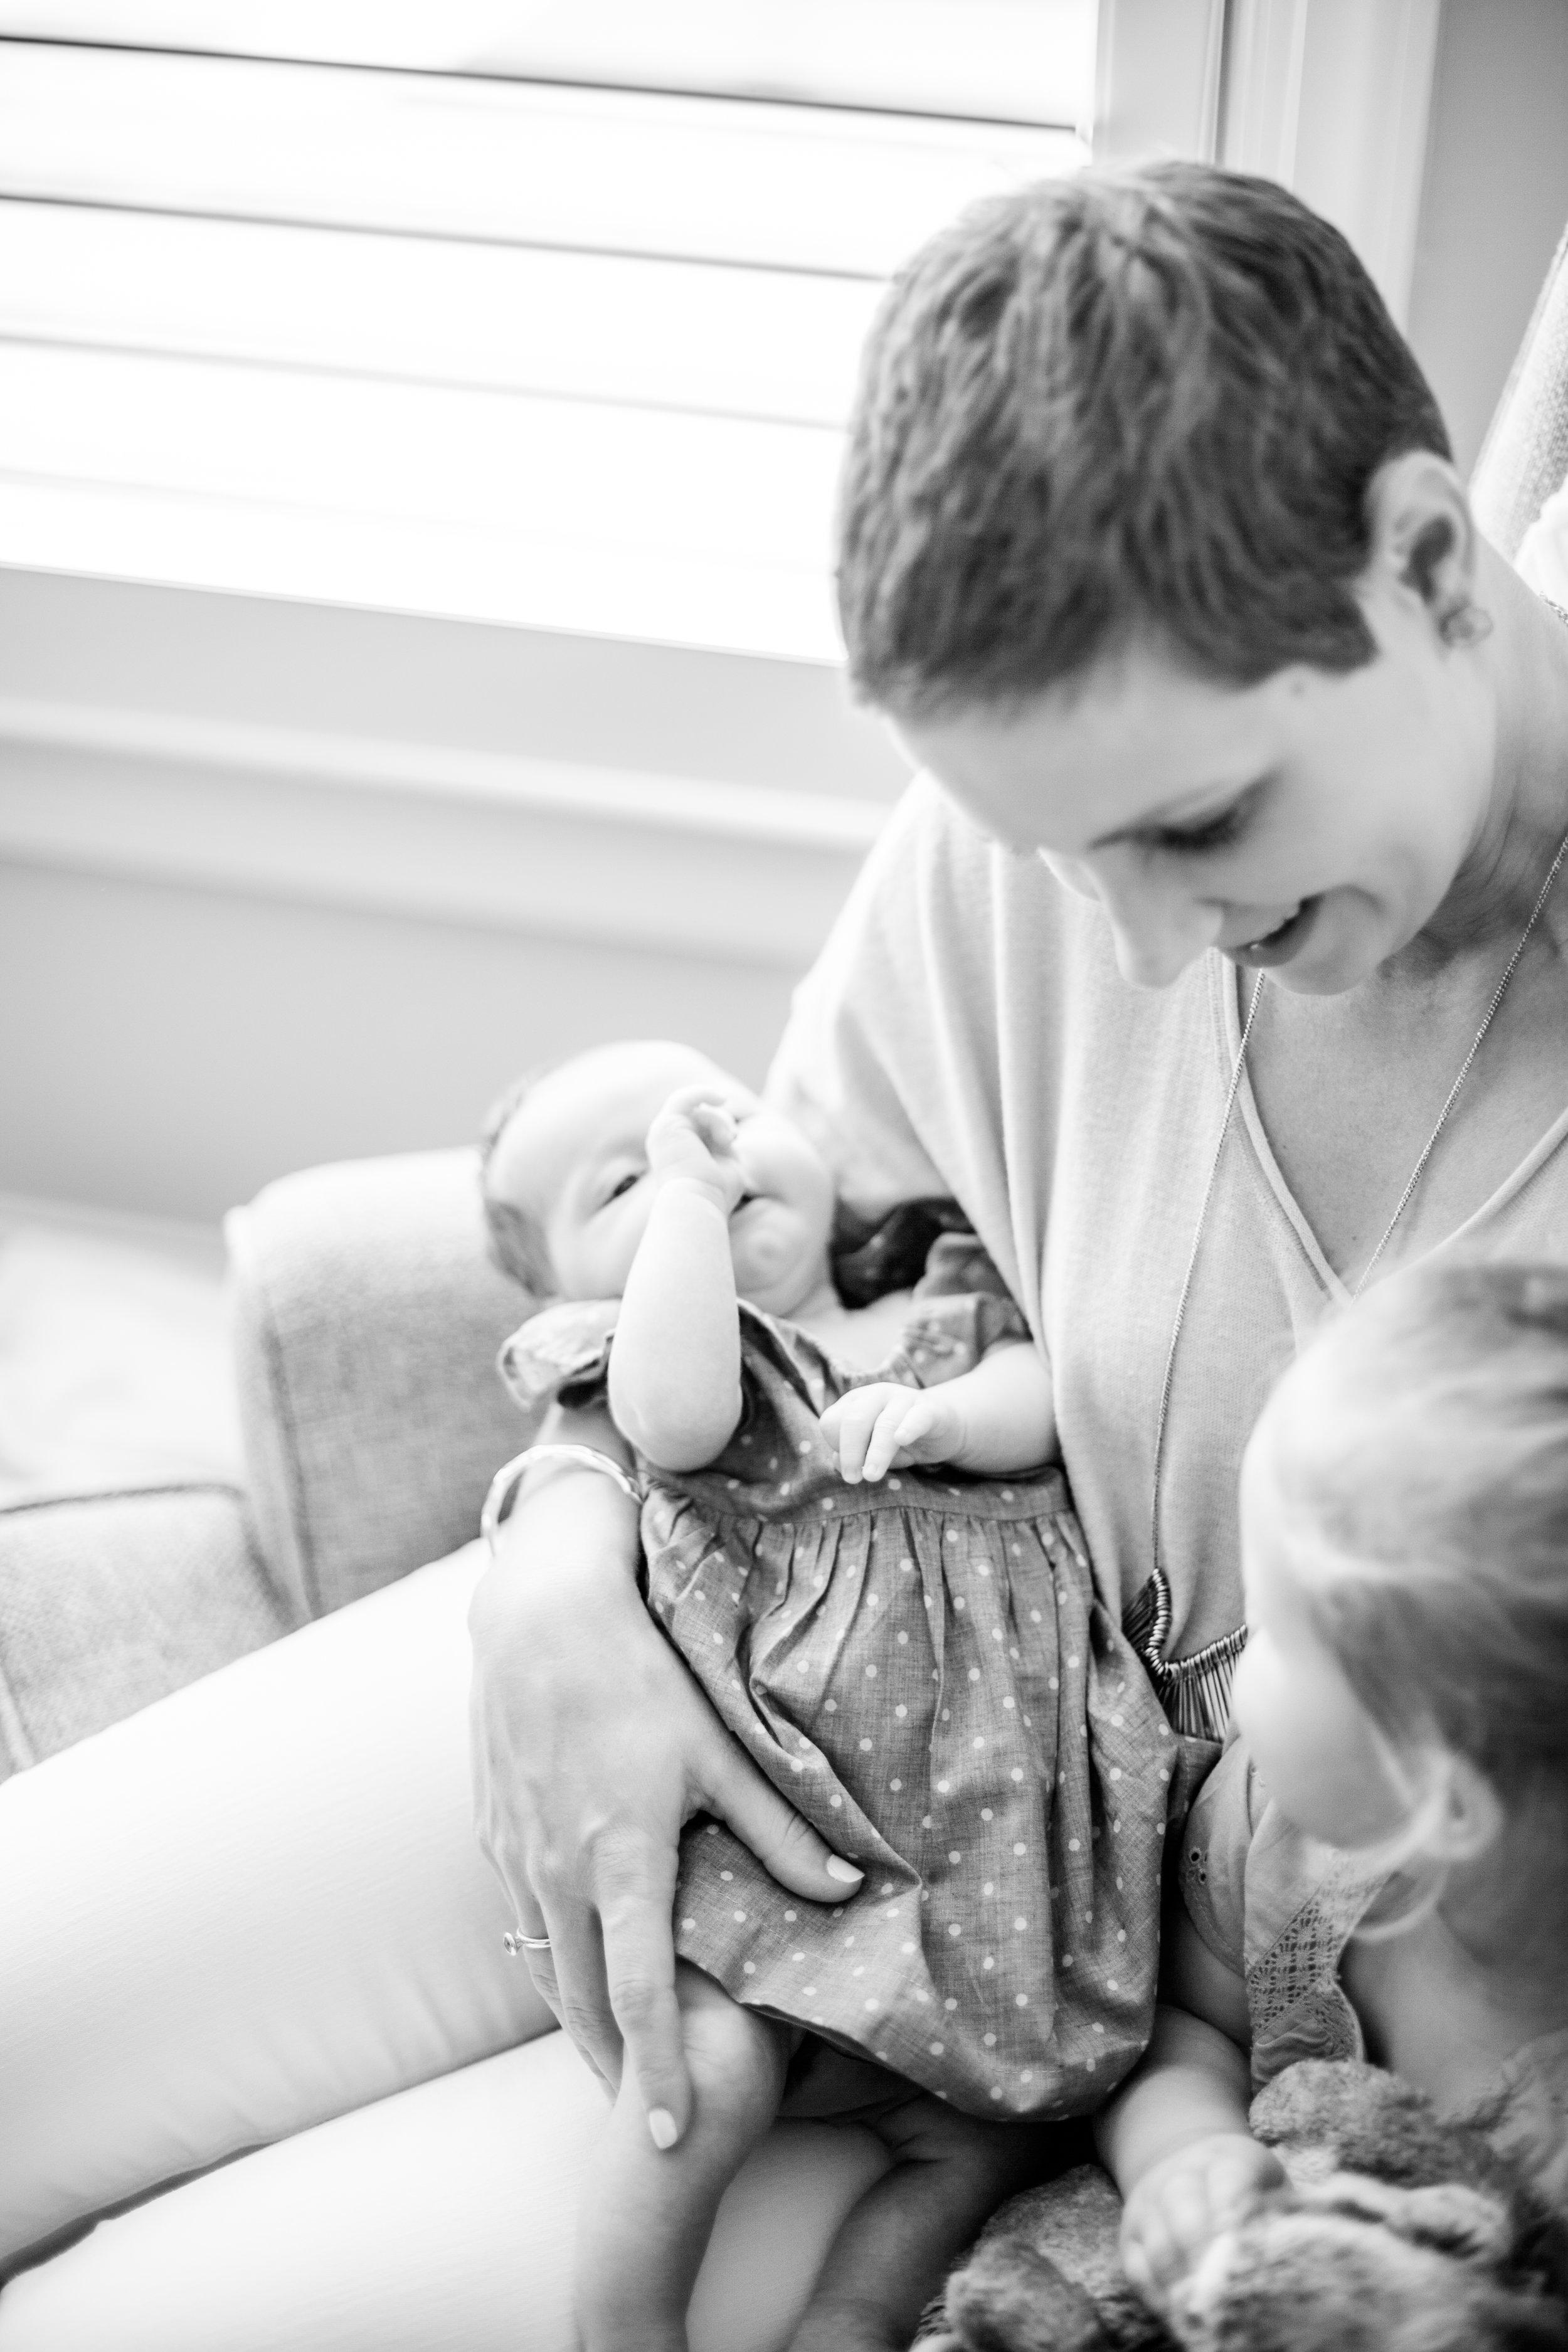 brookhaven-newborn-lifestyle-photography-with-sibling-angela-elliott-wingard-30.jpg